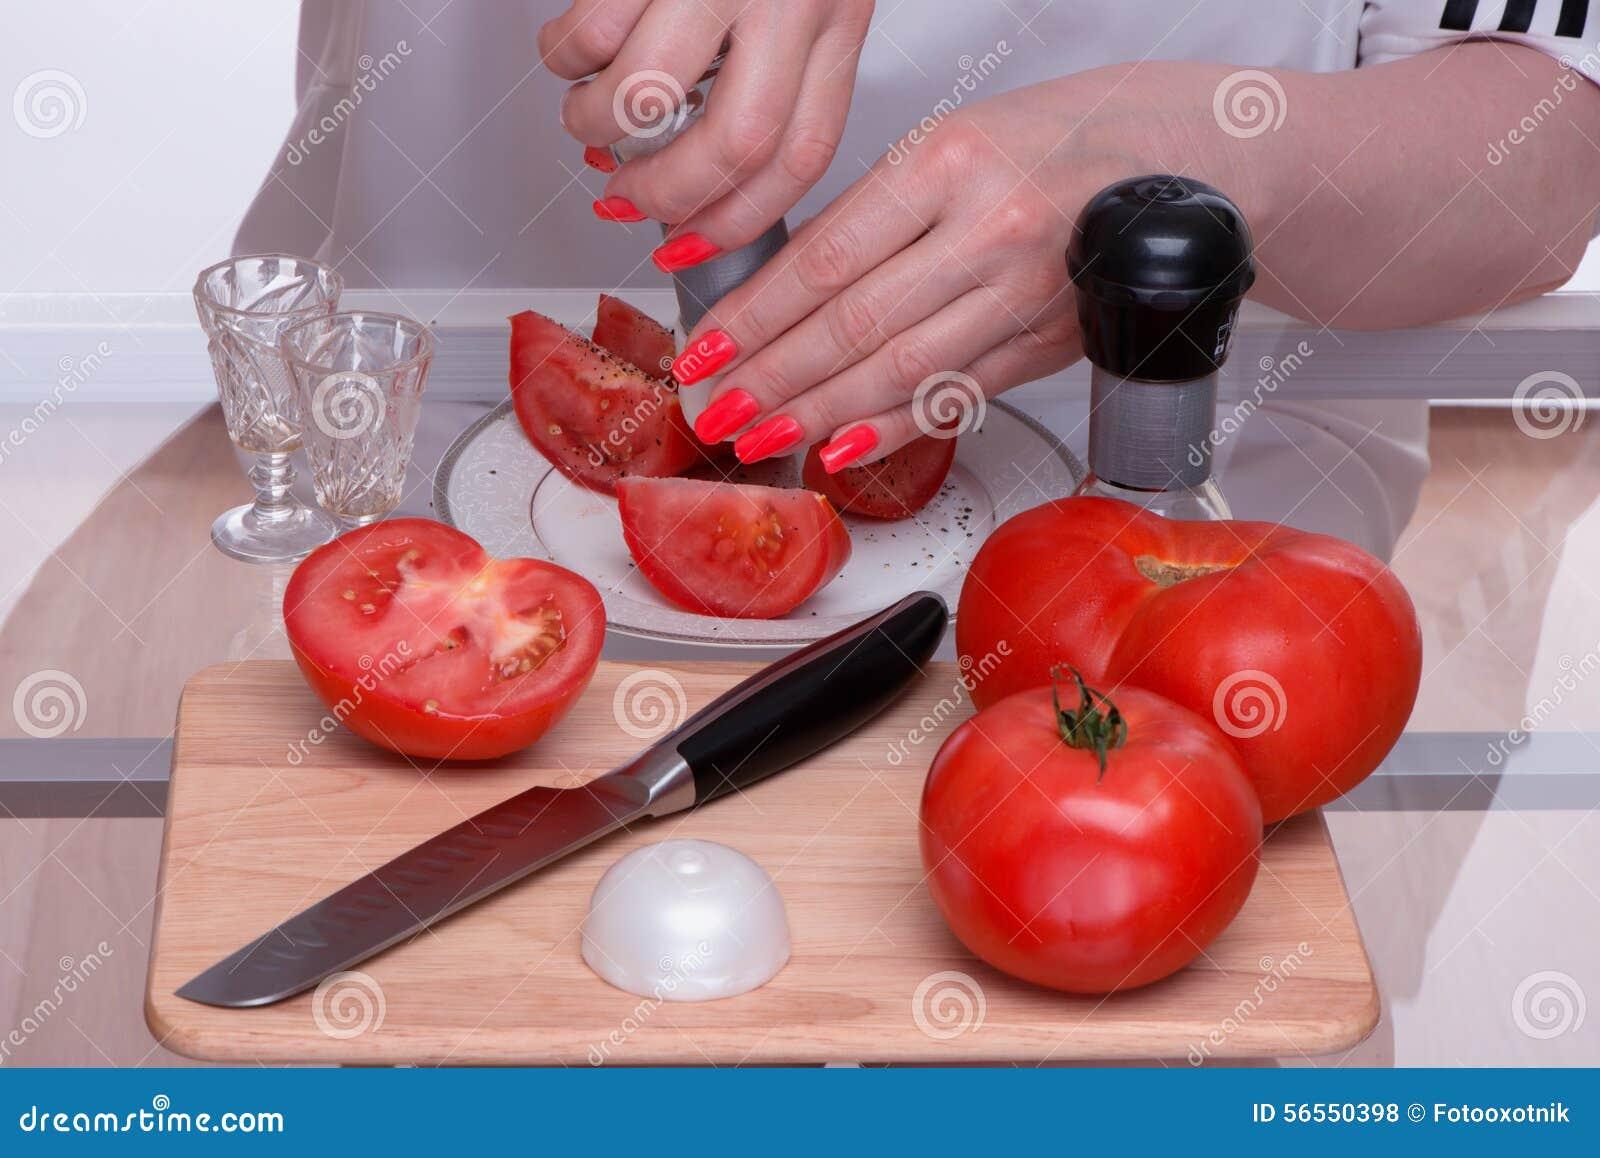 Download Ντομάτες και μαχαίρι σε έναν τεμαχίζοντας πίνακα Στοκ Εικόνες - εικόνα από χέρι, αρχιμάγειρας: 56550398